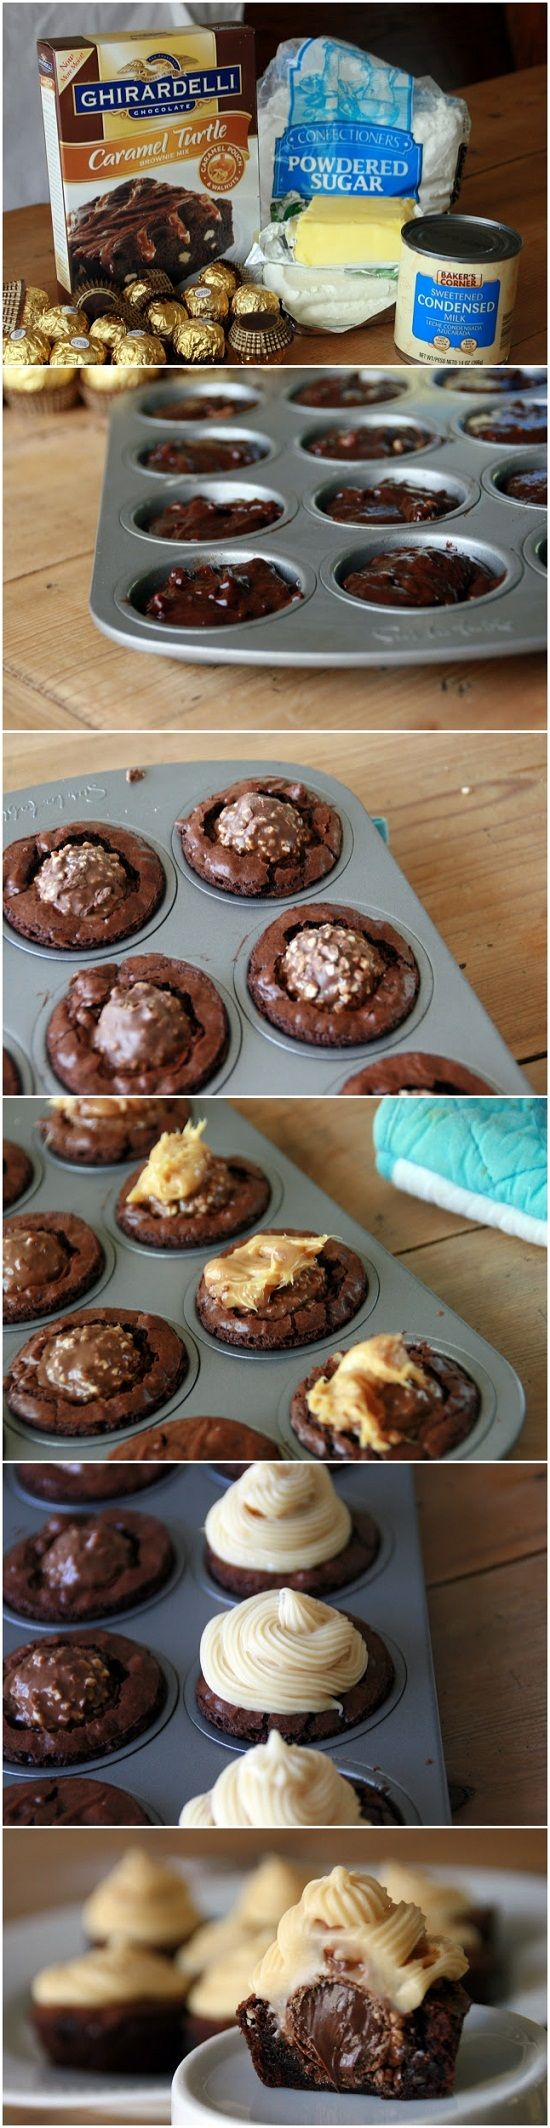 Ferrero Rocher Brownie Bites with Caramel-Cream Cheese Icing Recipe